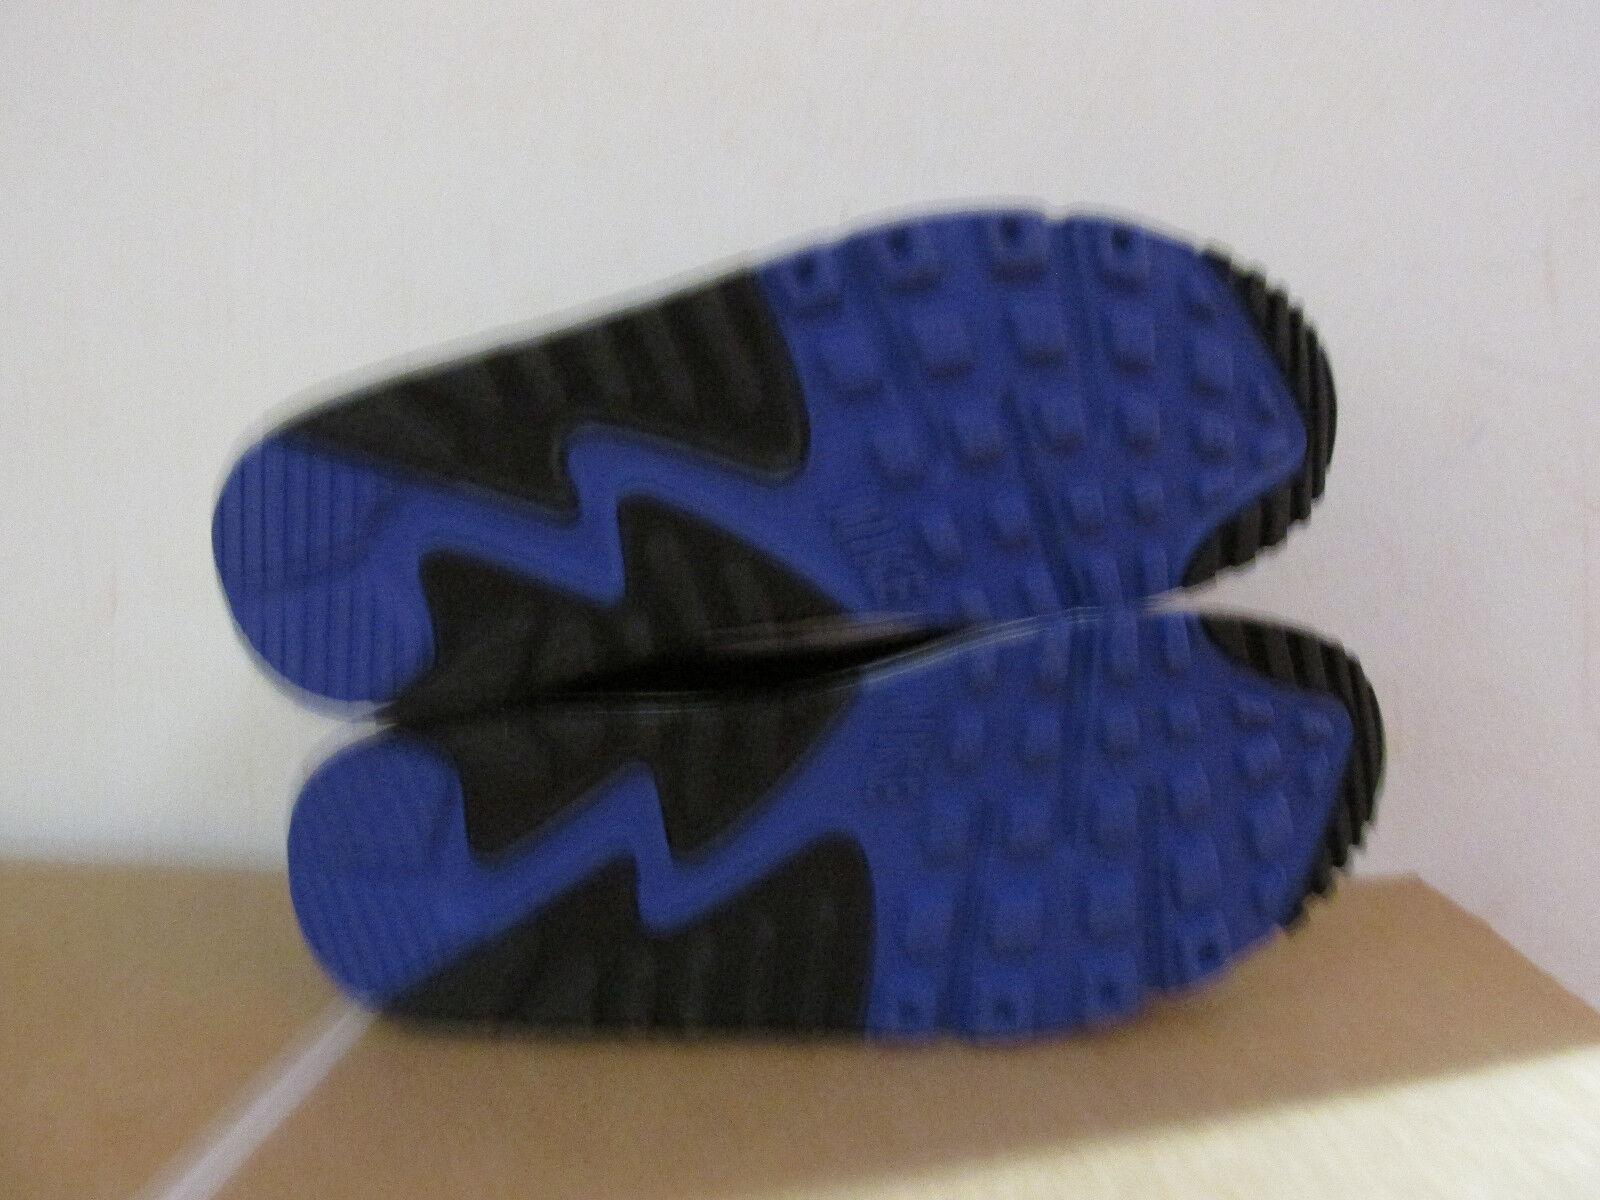 Nike Air Max Max Max 90 Ätherische Herren Laufschuhe 537384 052 Sneakers Räumung 06b02b